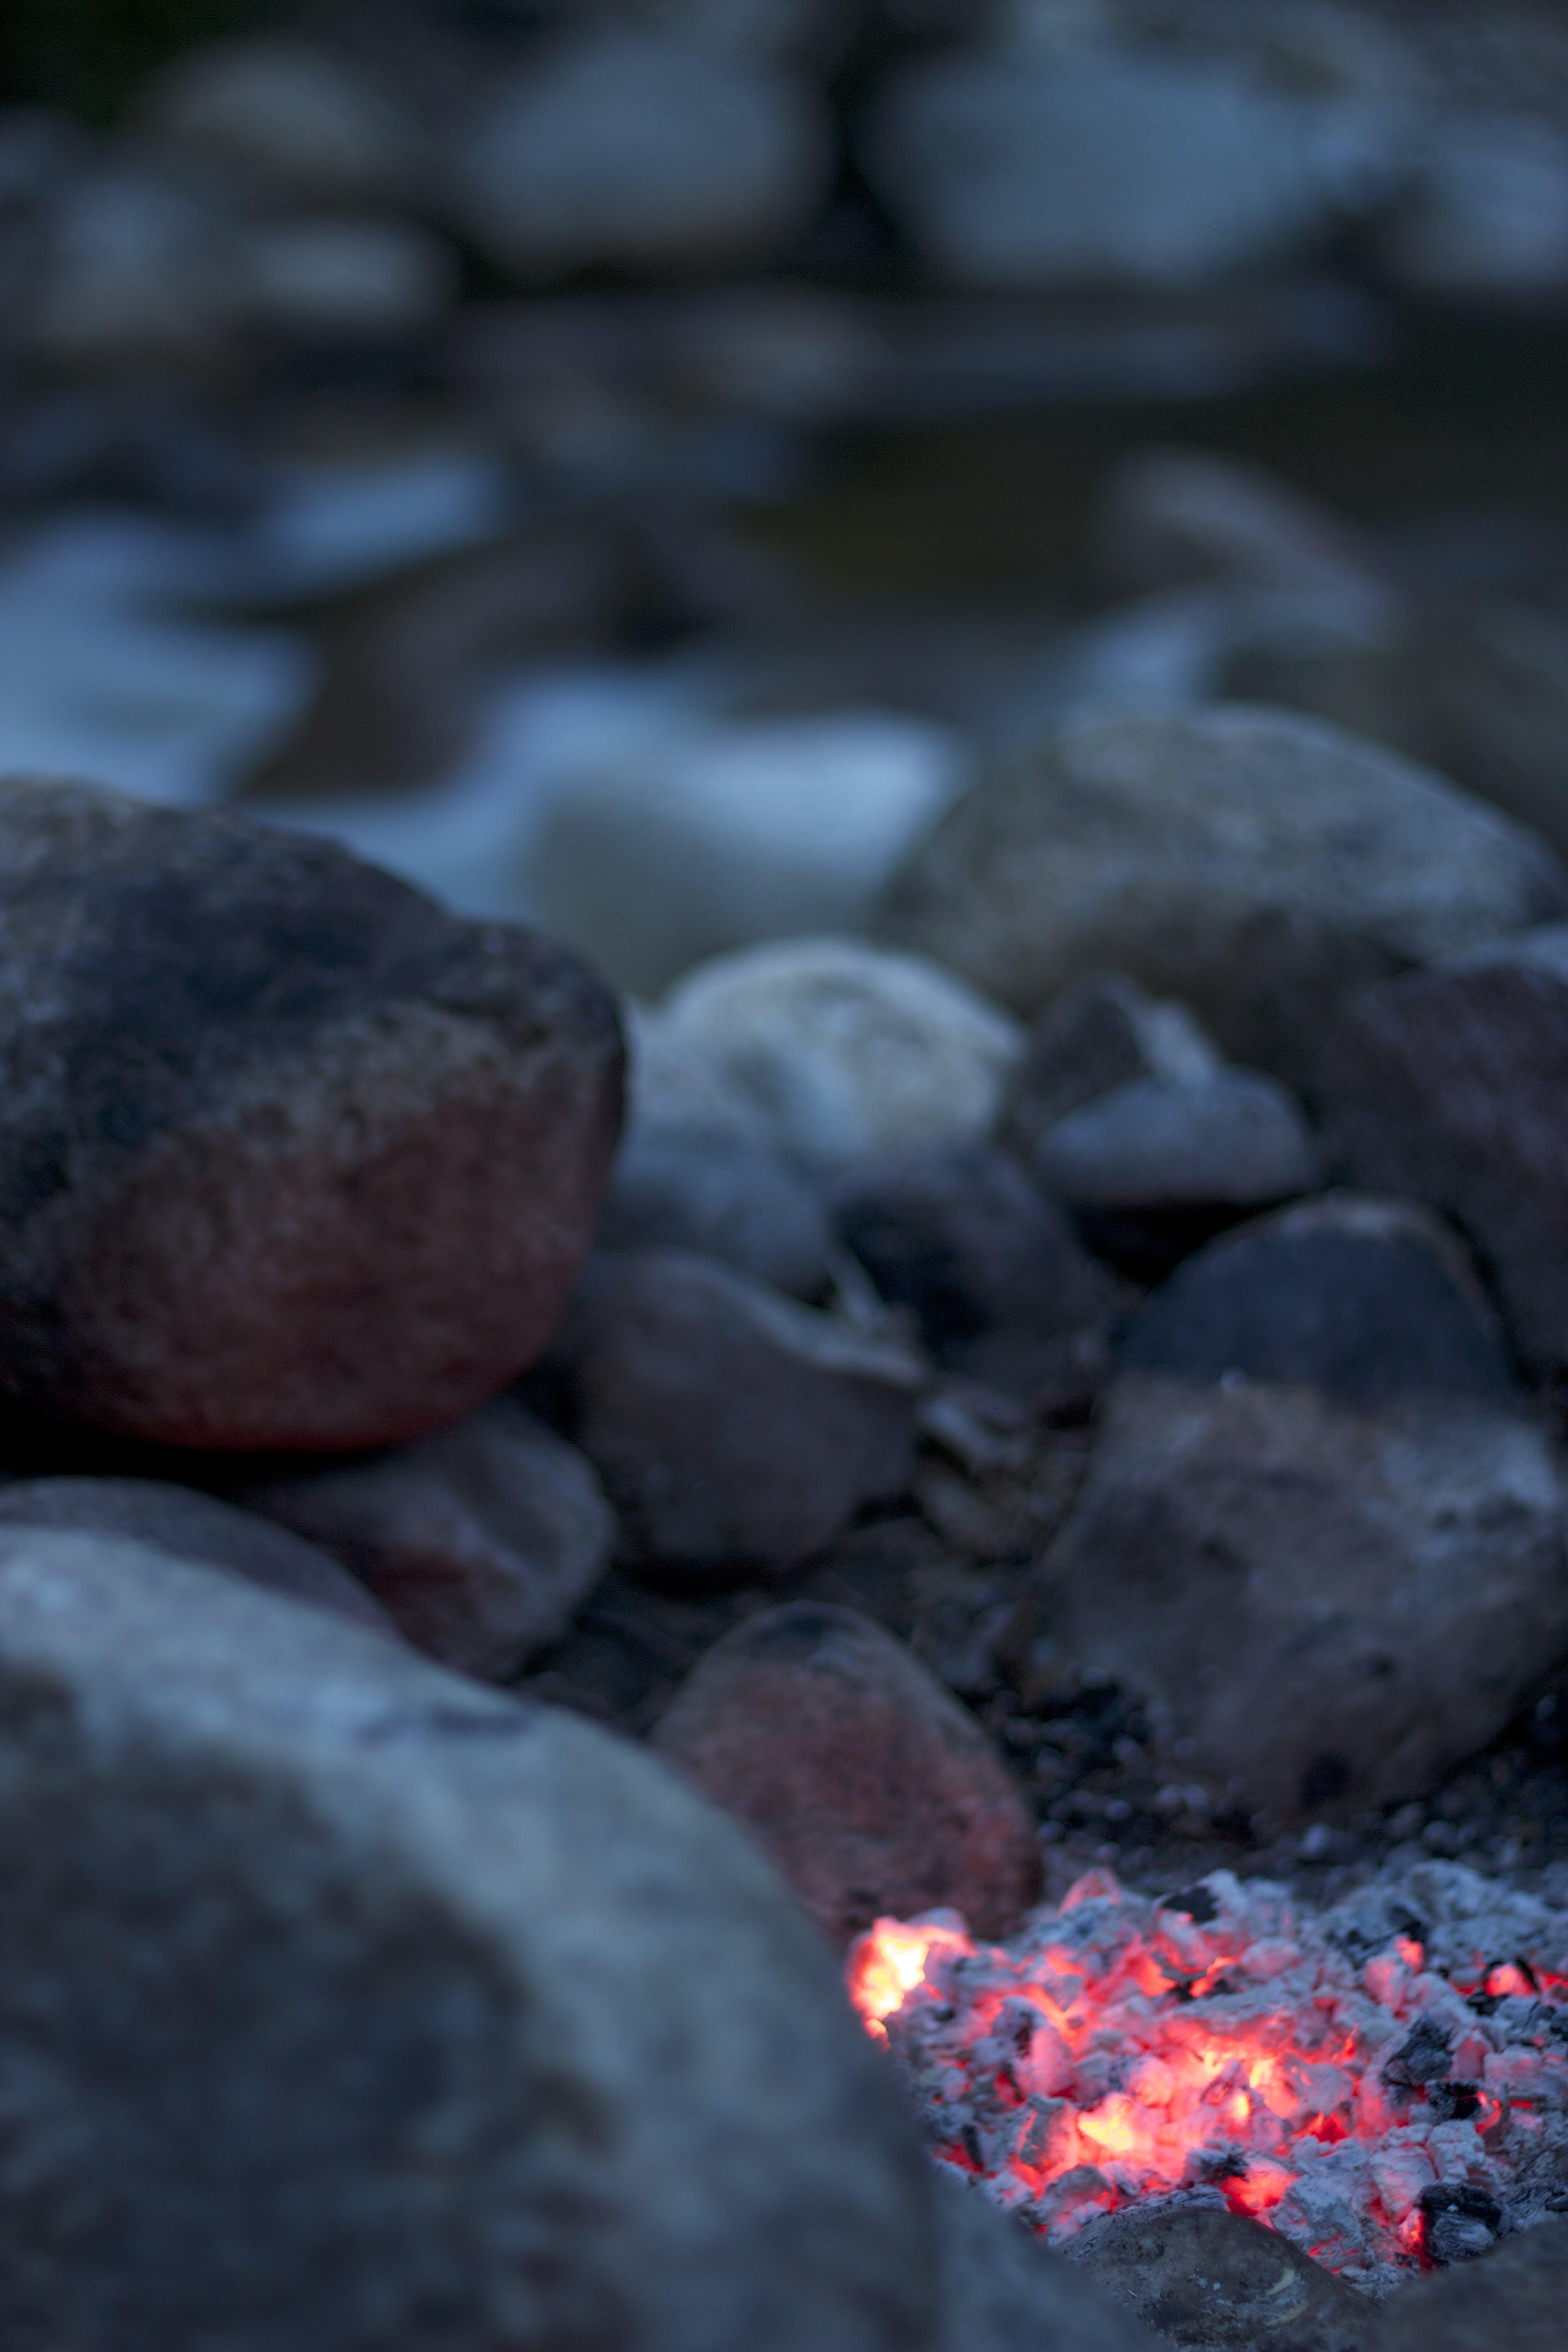 Burning Firelog Surrounded of Pebbles